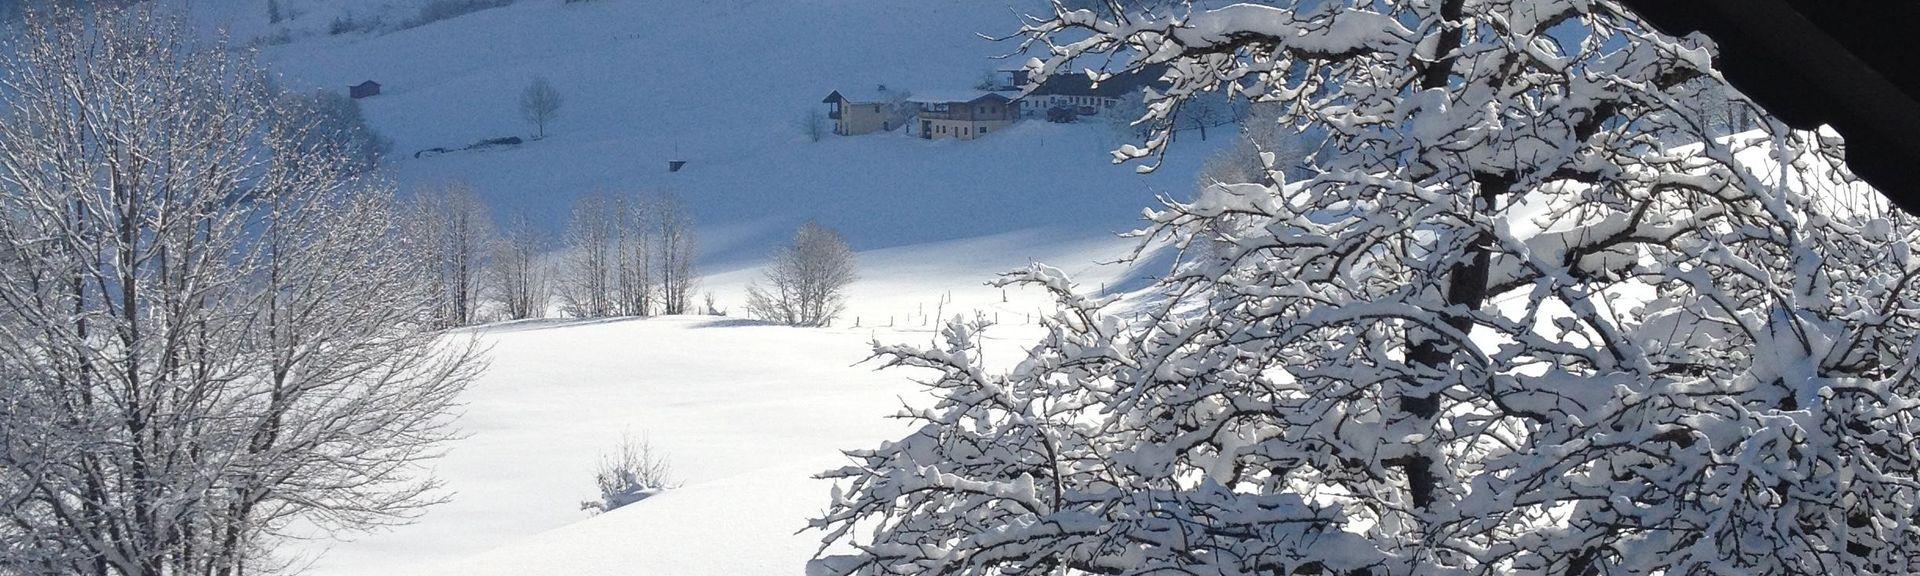 Telesquí Kammerkoehr, Waidring, Tirol, Austria